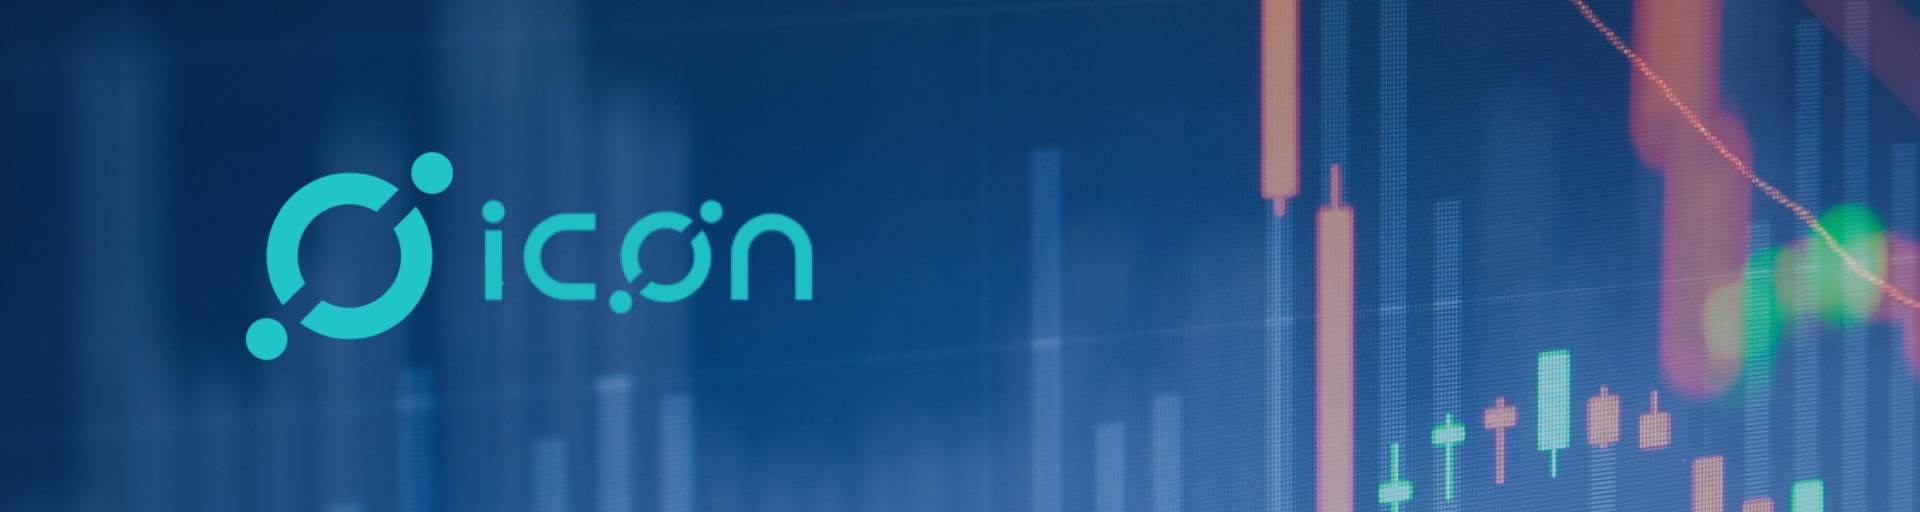 ICON-trading-12412